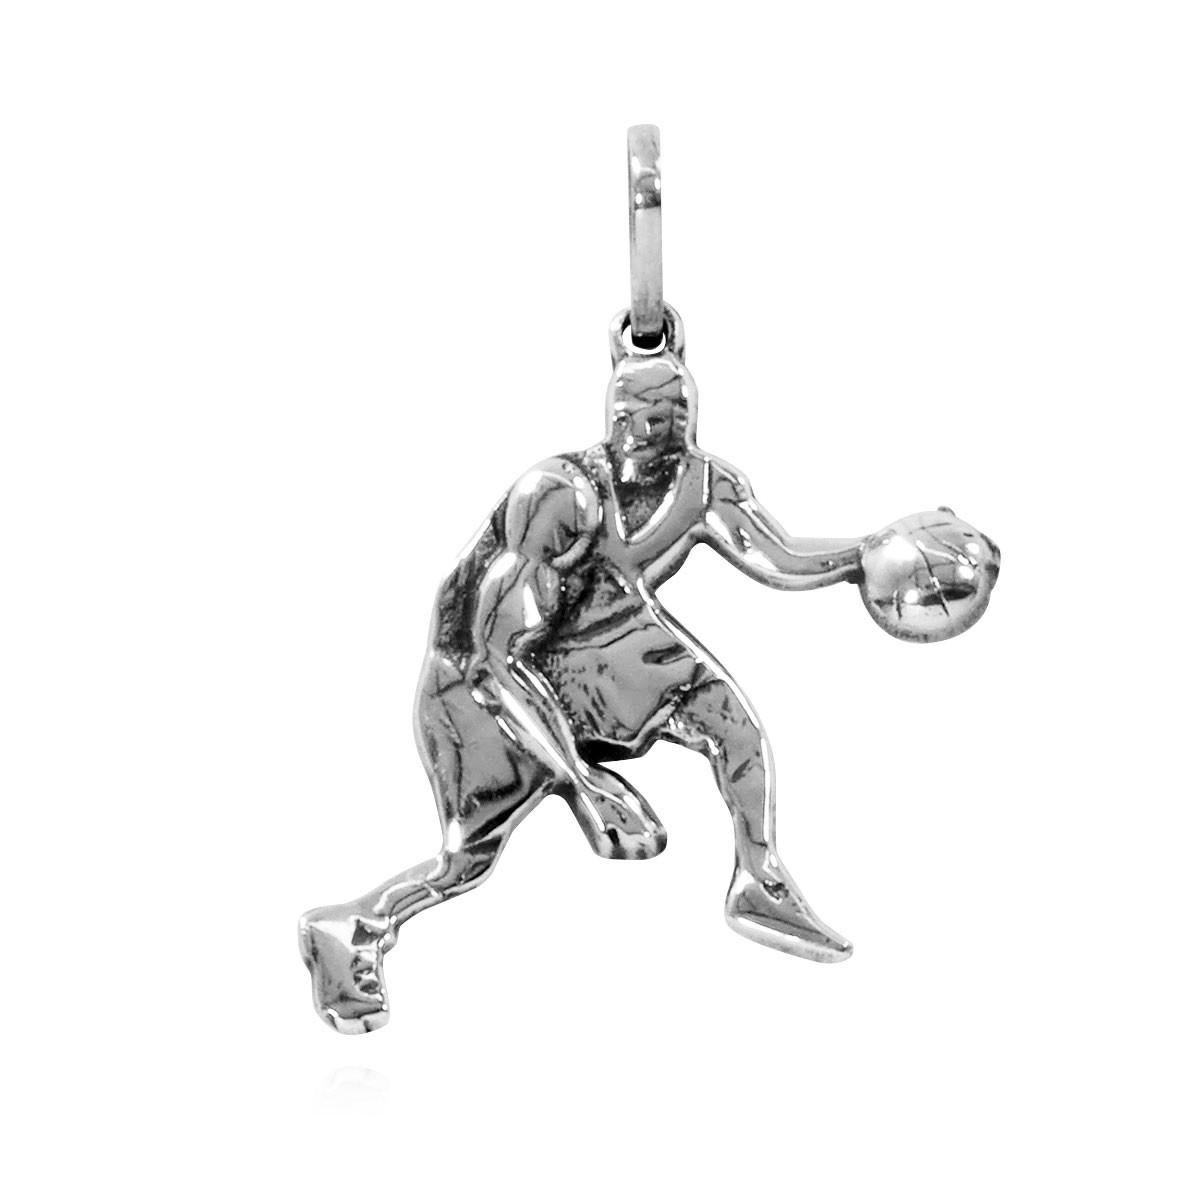 Pingente Jogador de Basquete Basquetista Basketball - 95912  - Arte Ativa